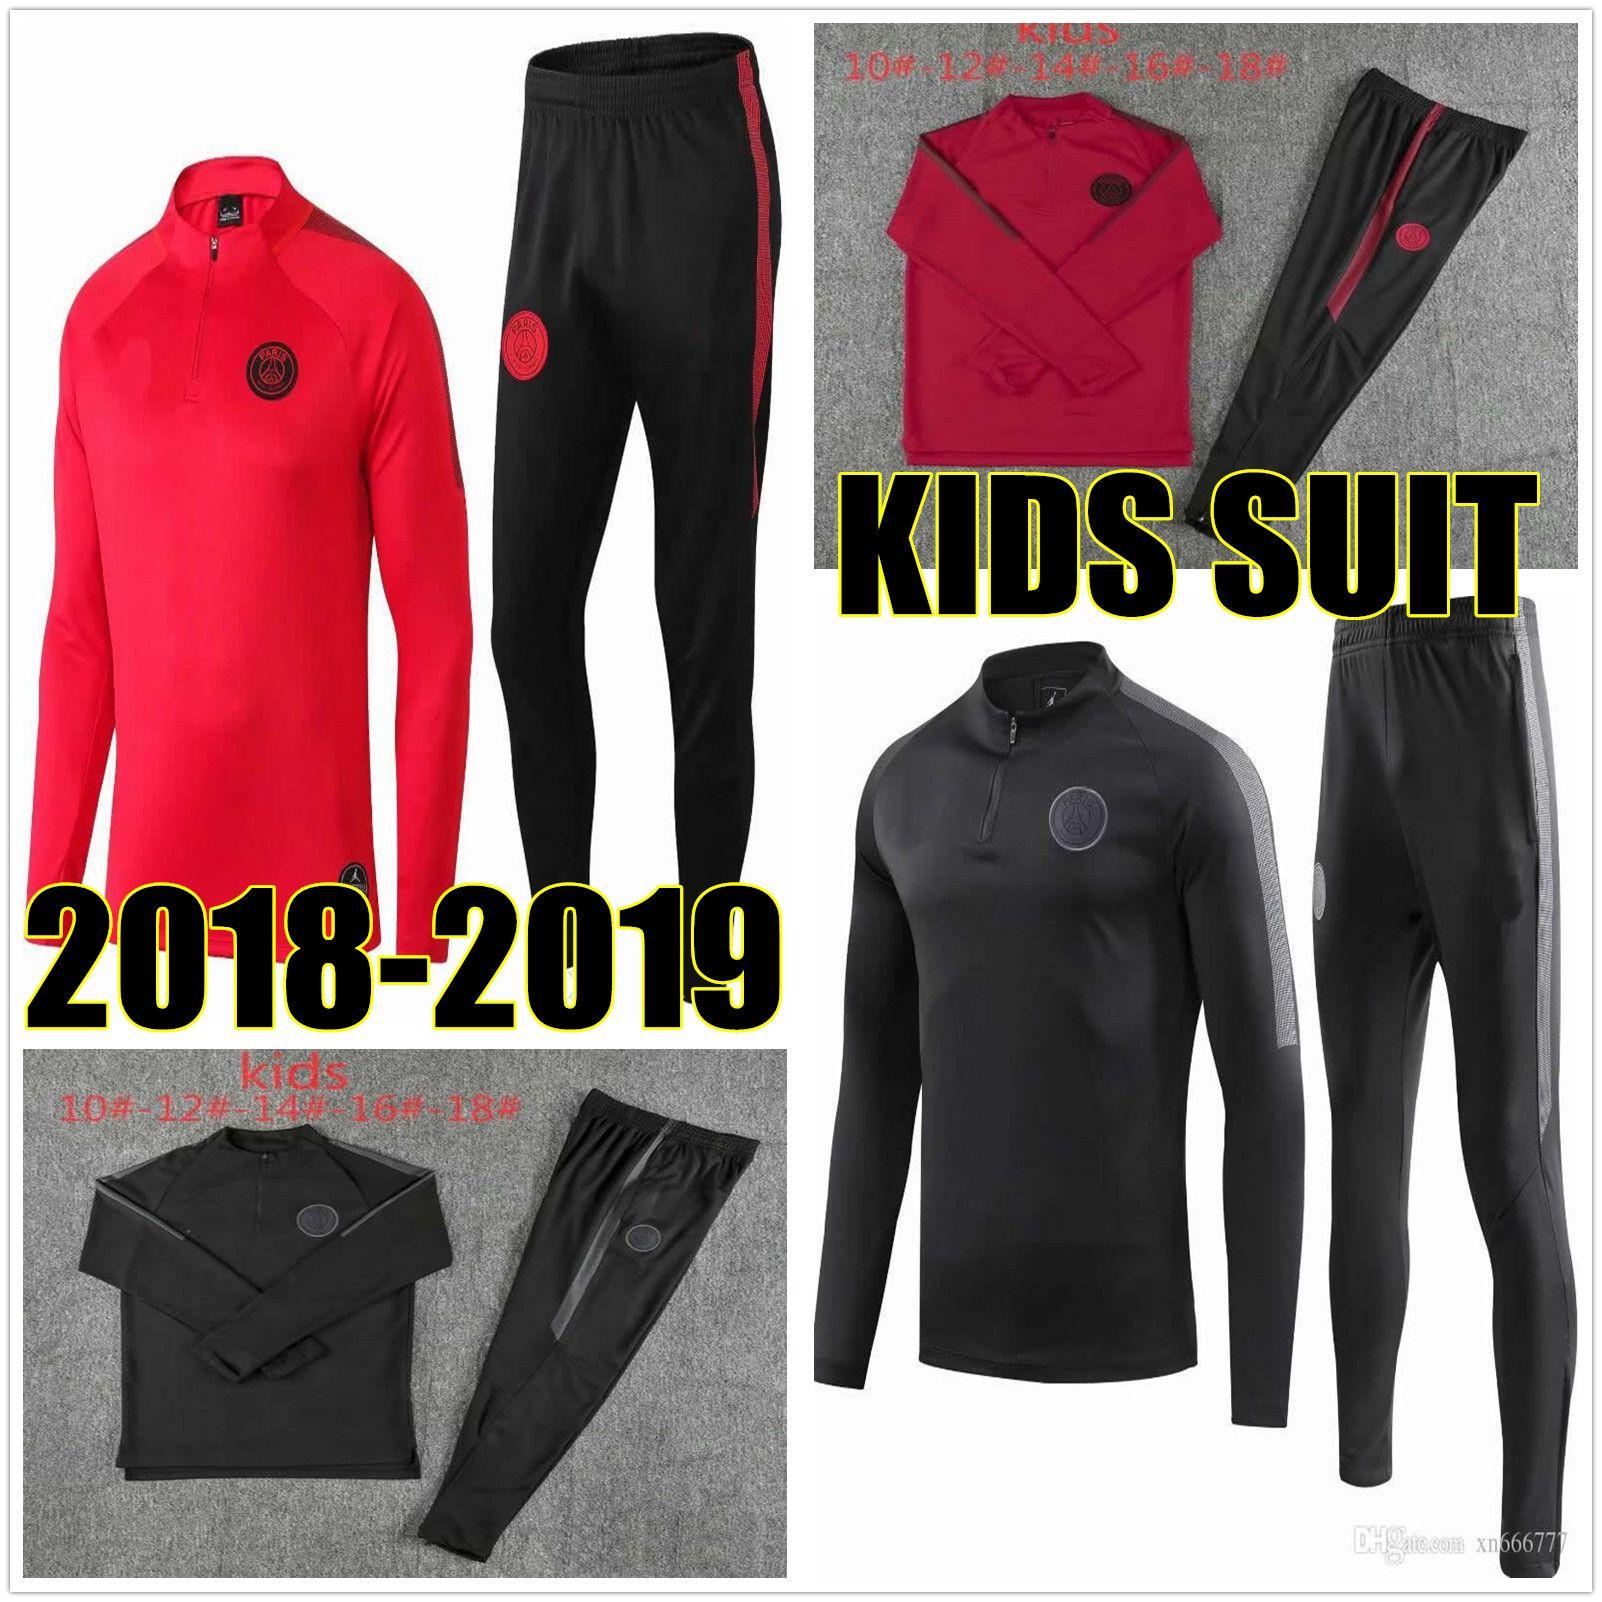 dcb40cd7c 2019 2018 2019 Kid PSG Tracksuit MBAPPE Kids Kits 18 19 Paris Champions  League Soccer Training Suit Tracksuits 18 19 Maillot De Foot Boys Jacket  From ...